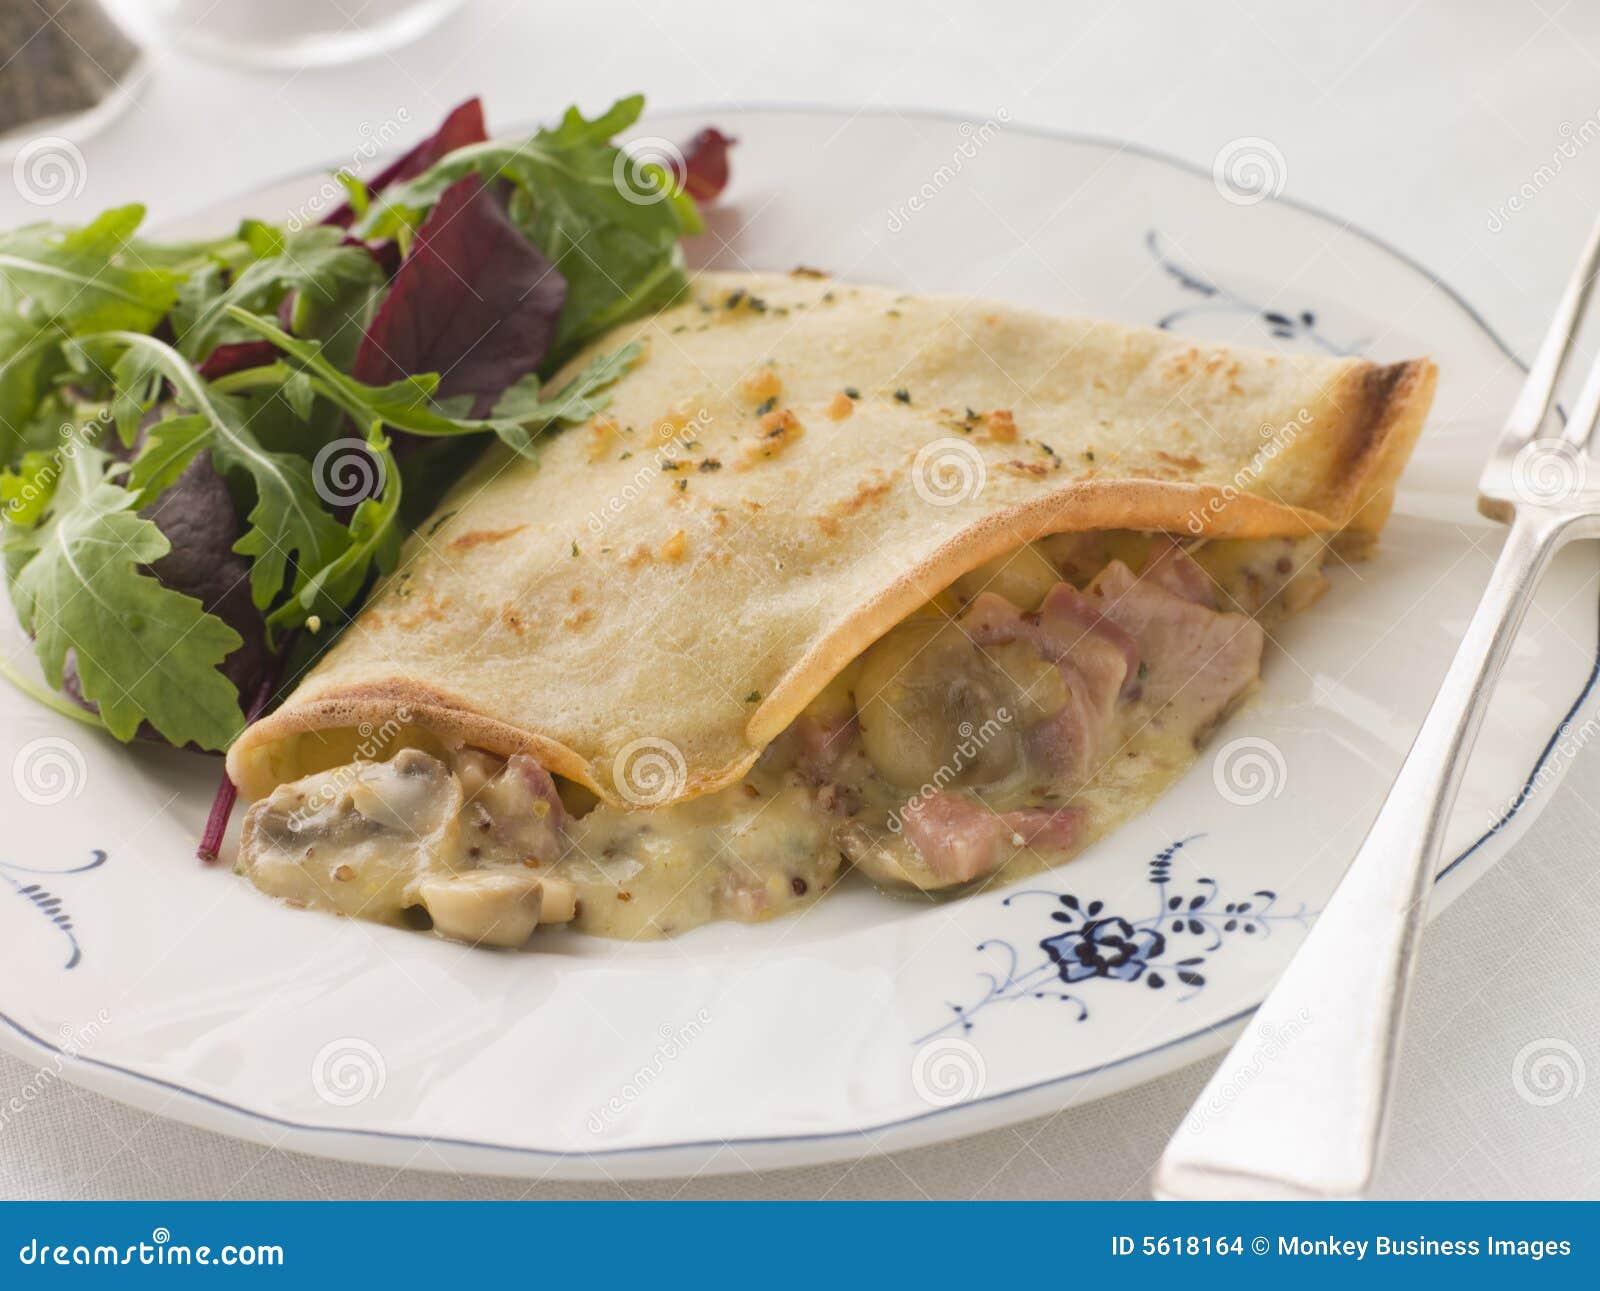 Savoury Pancake filled with Ham Cheese